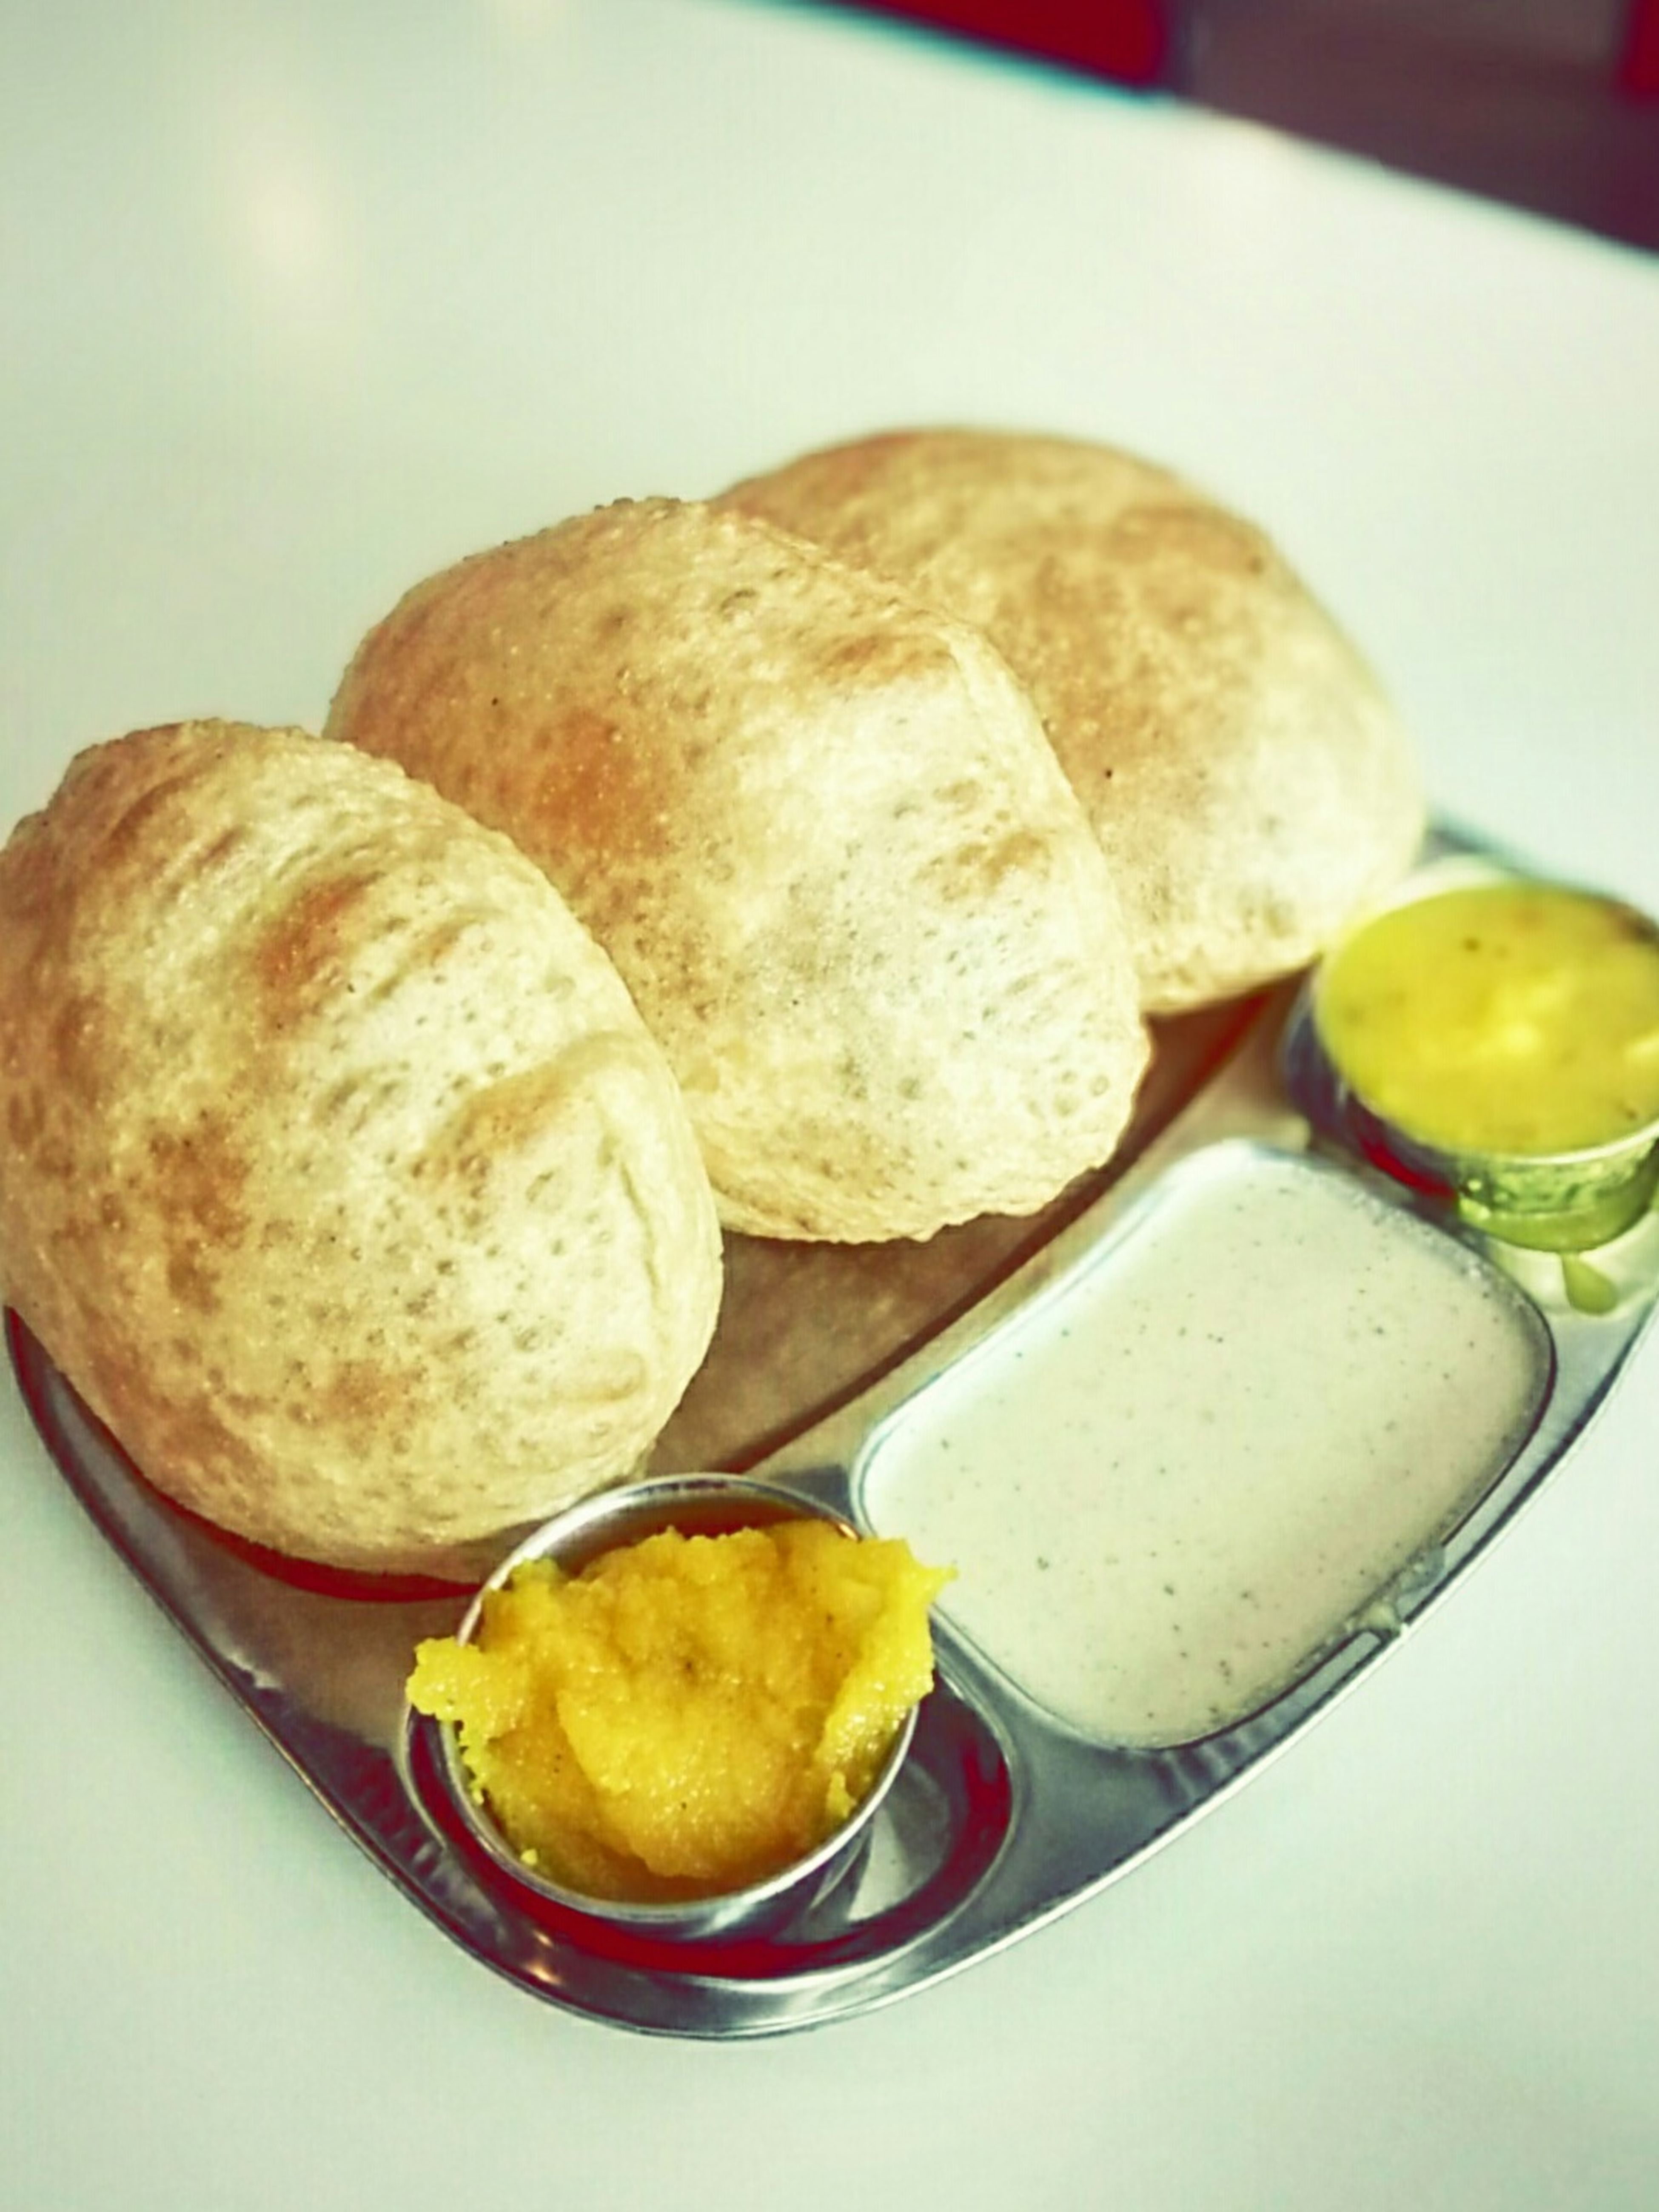 Show Us Your Takeaway! Indianfood Purisabji Puriaaloo Poorihalwa Poorichutney Garampoori Yummypoori